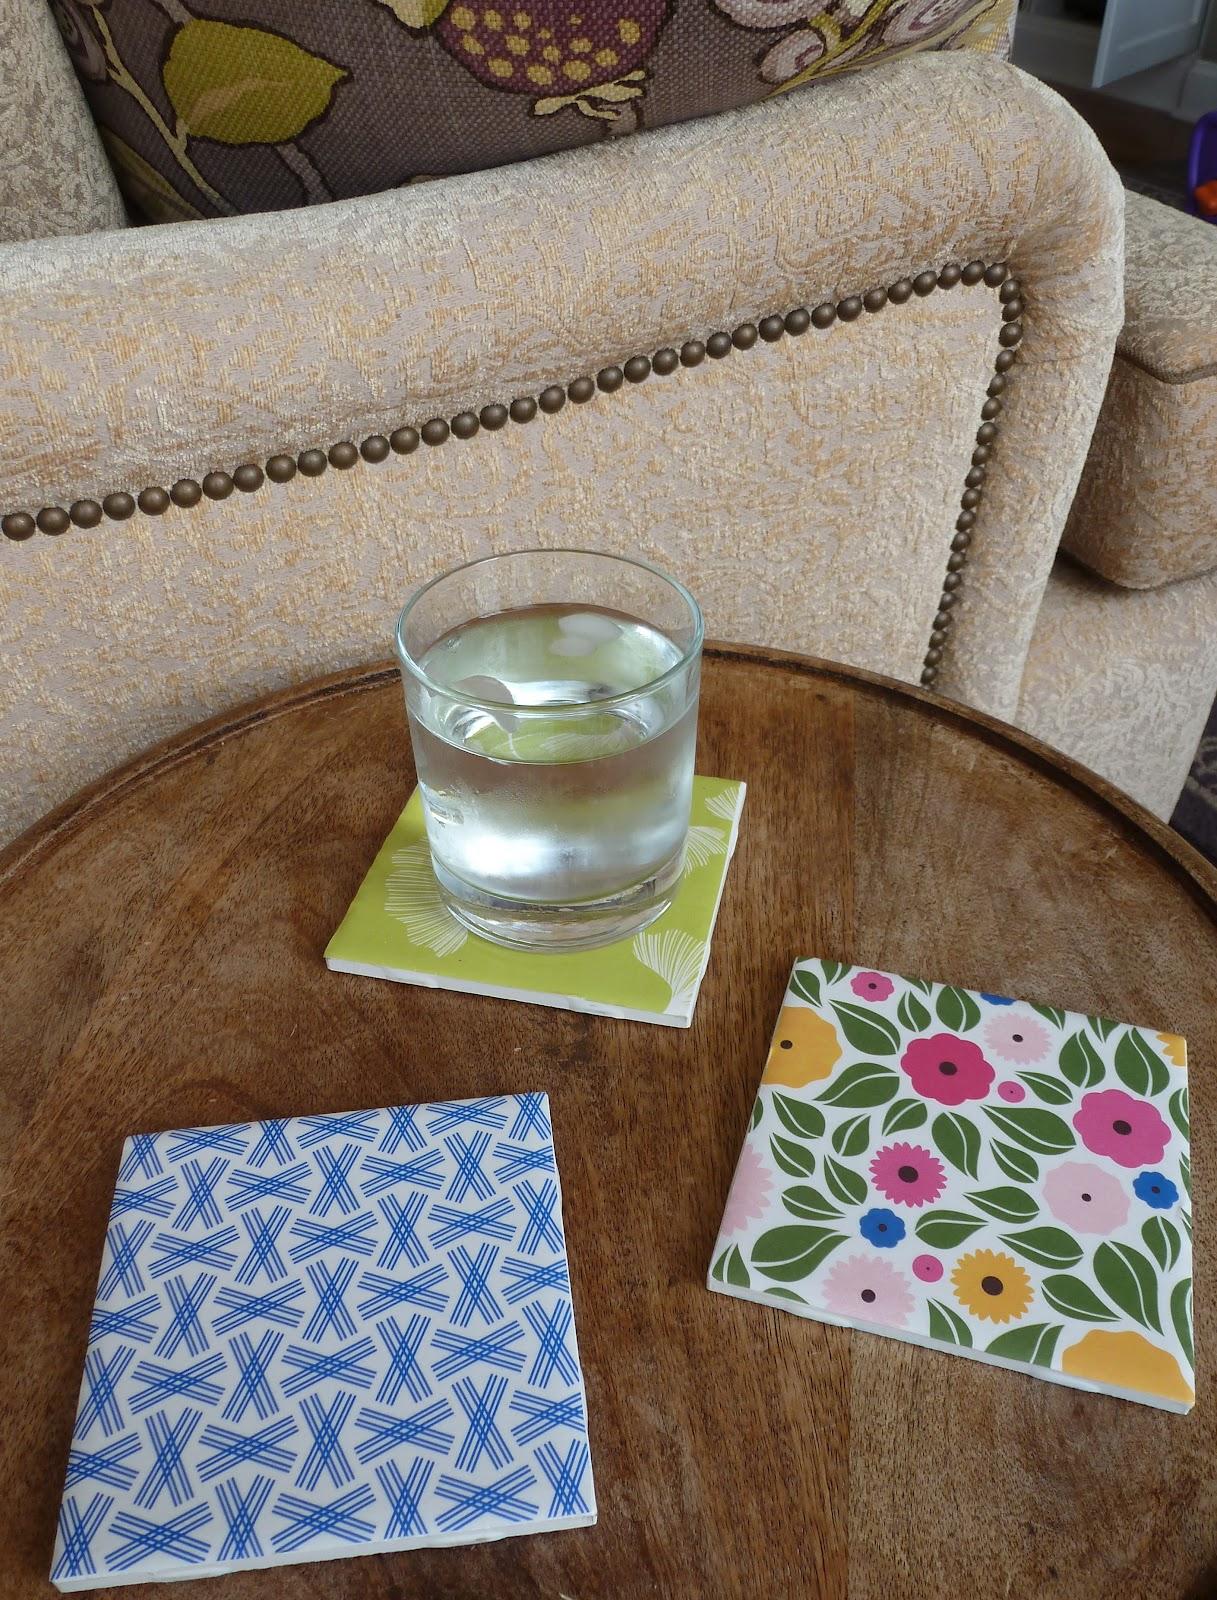 diy night tile coasters with scrapbook